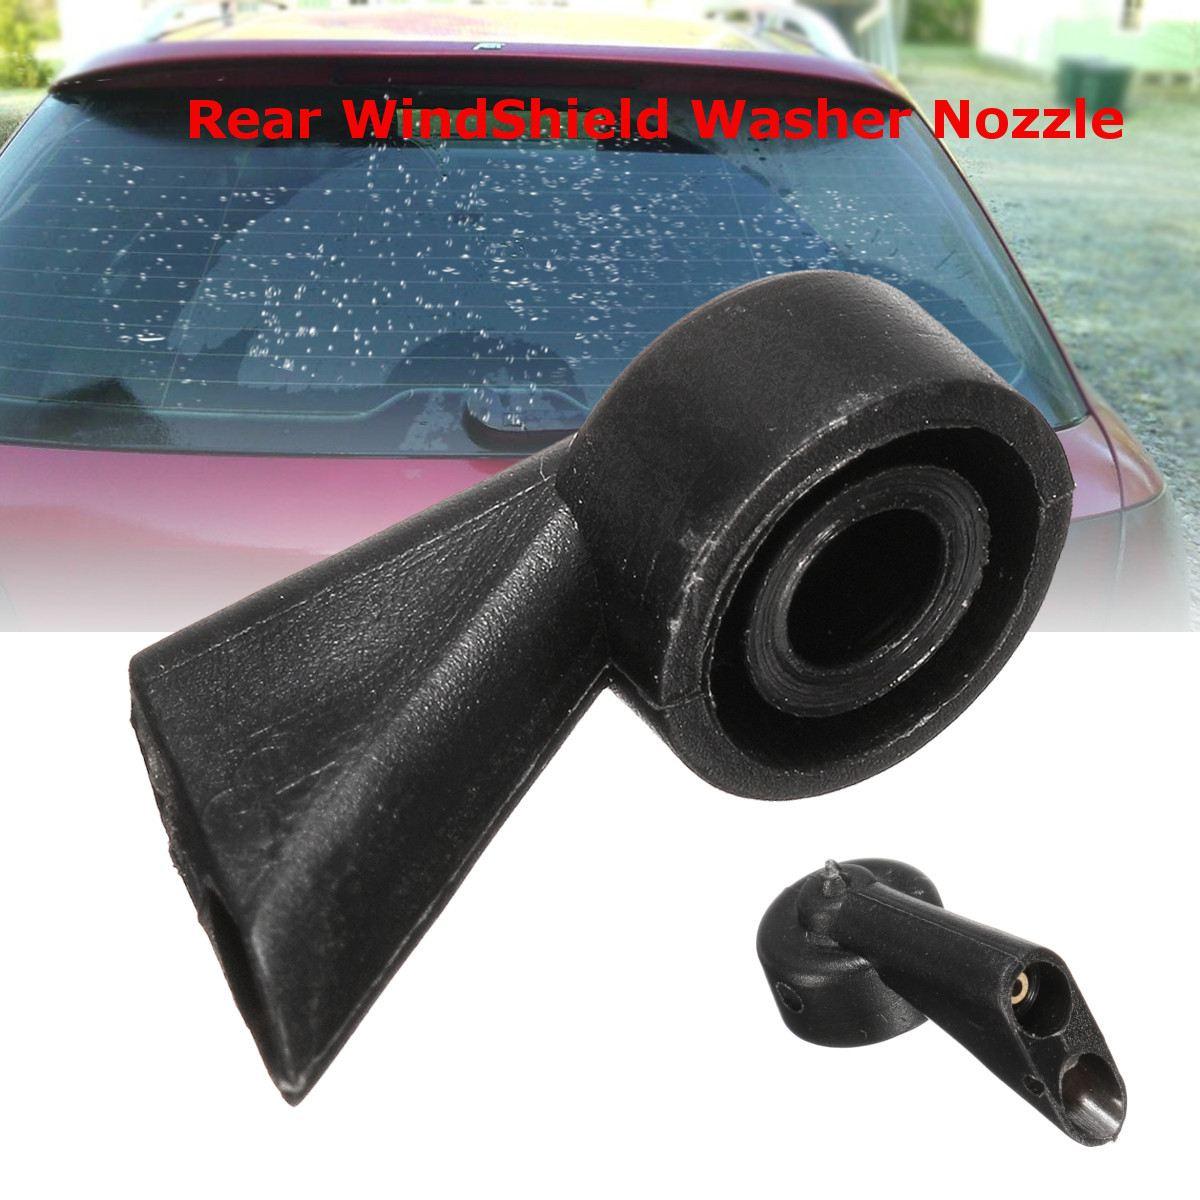 Rear WindShield Wiper Washer Nozzle Spray Jet For Audi A1 A3 A4 Q7  8E9955985 8K9955985A